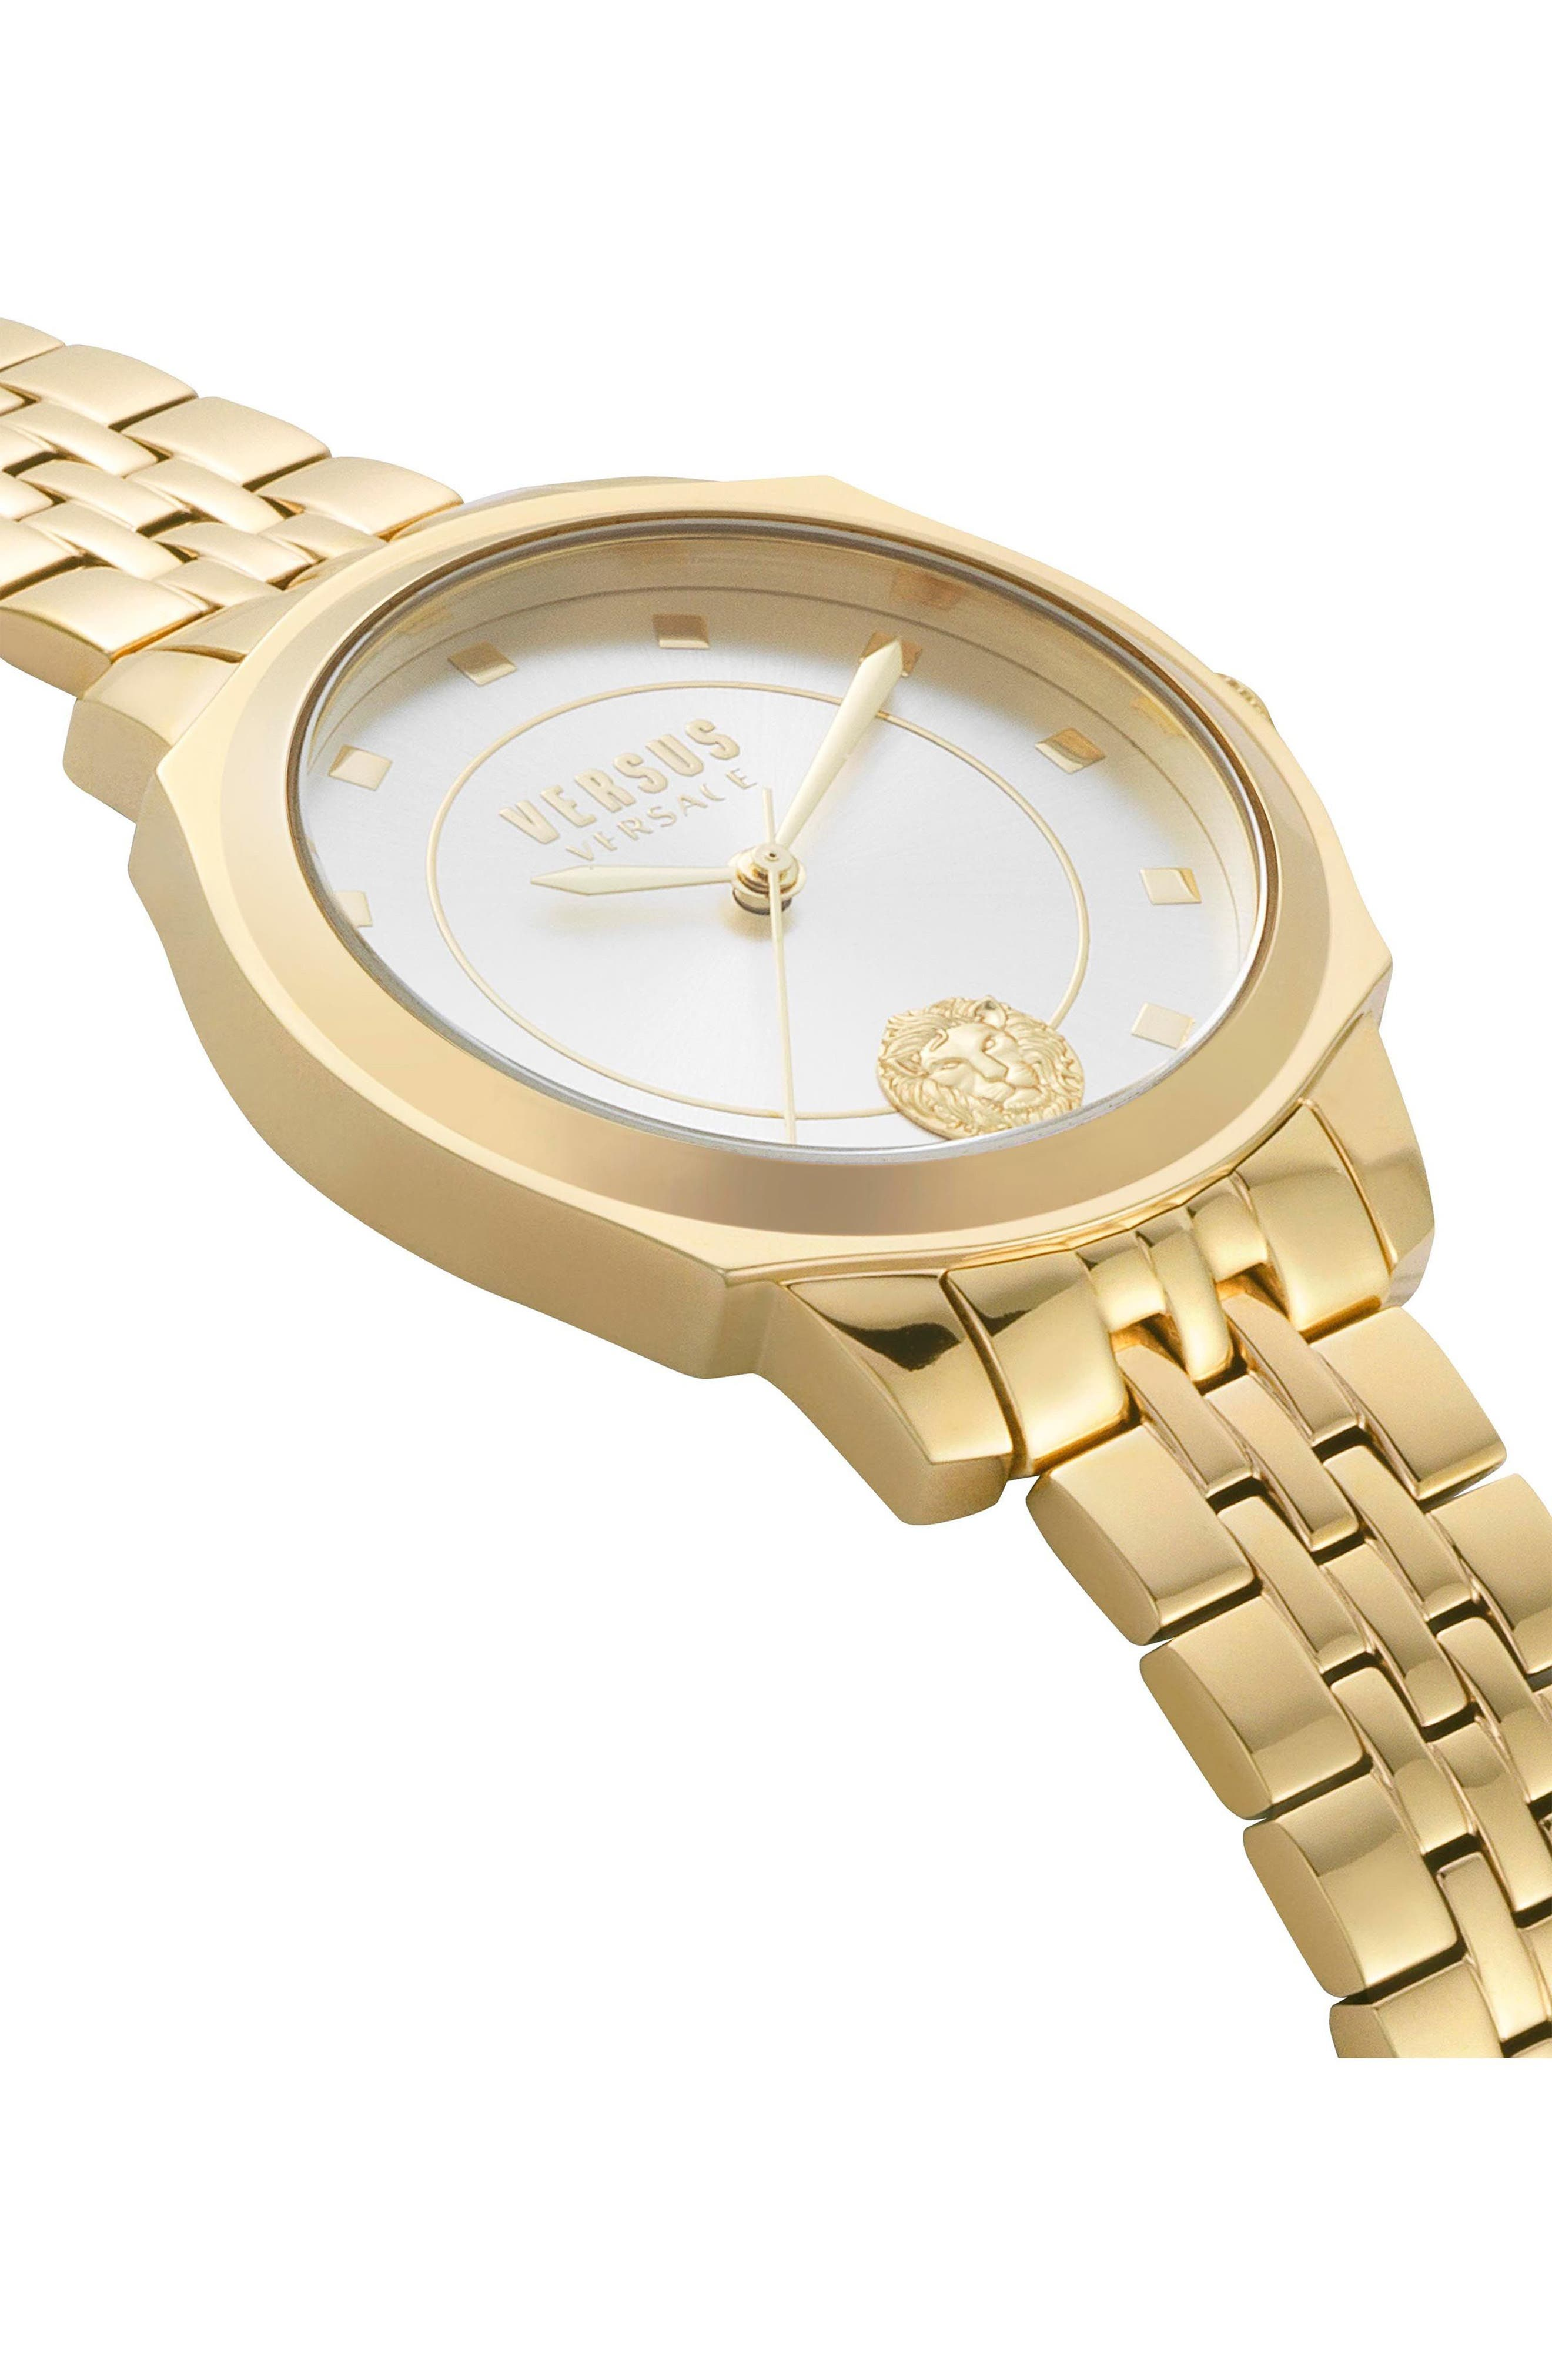 VERSUS by Versace Chelsea Bracelet Watch, 34mm,                             Alternate thumbnail 3, color,                             Gold/ Silver/ Gold